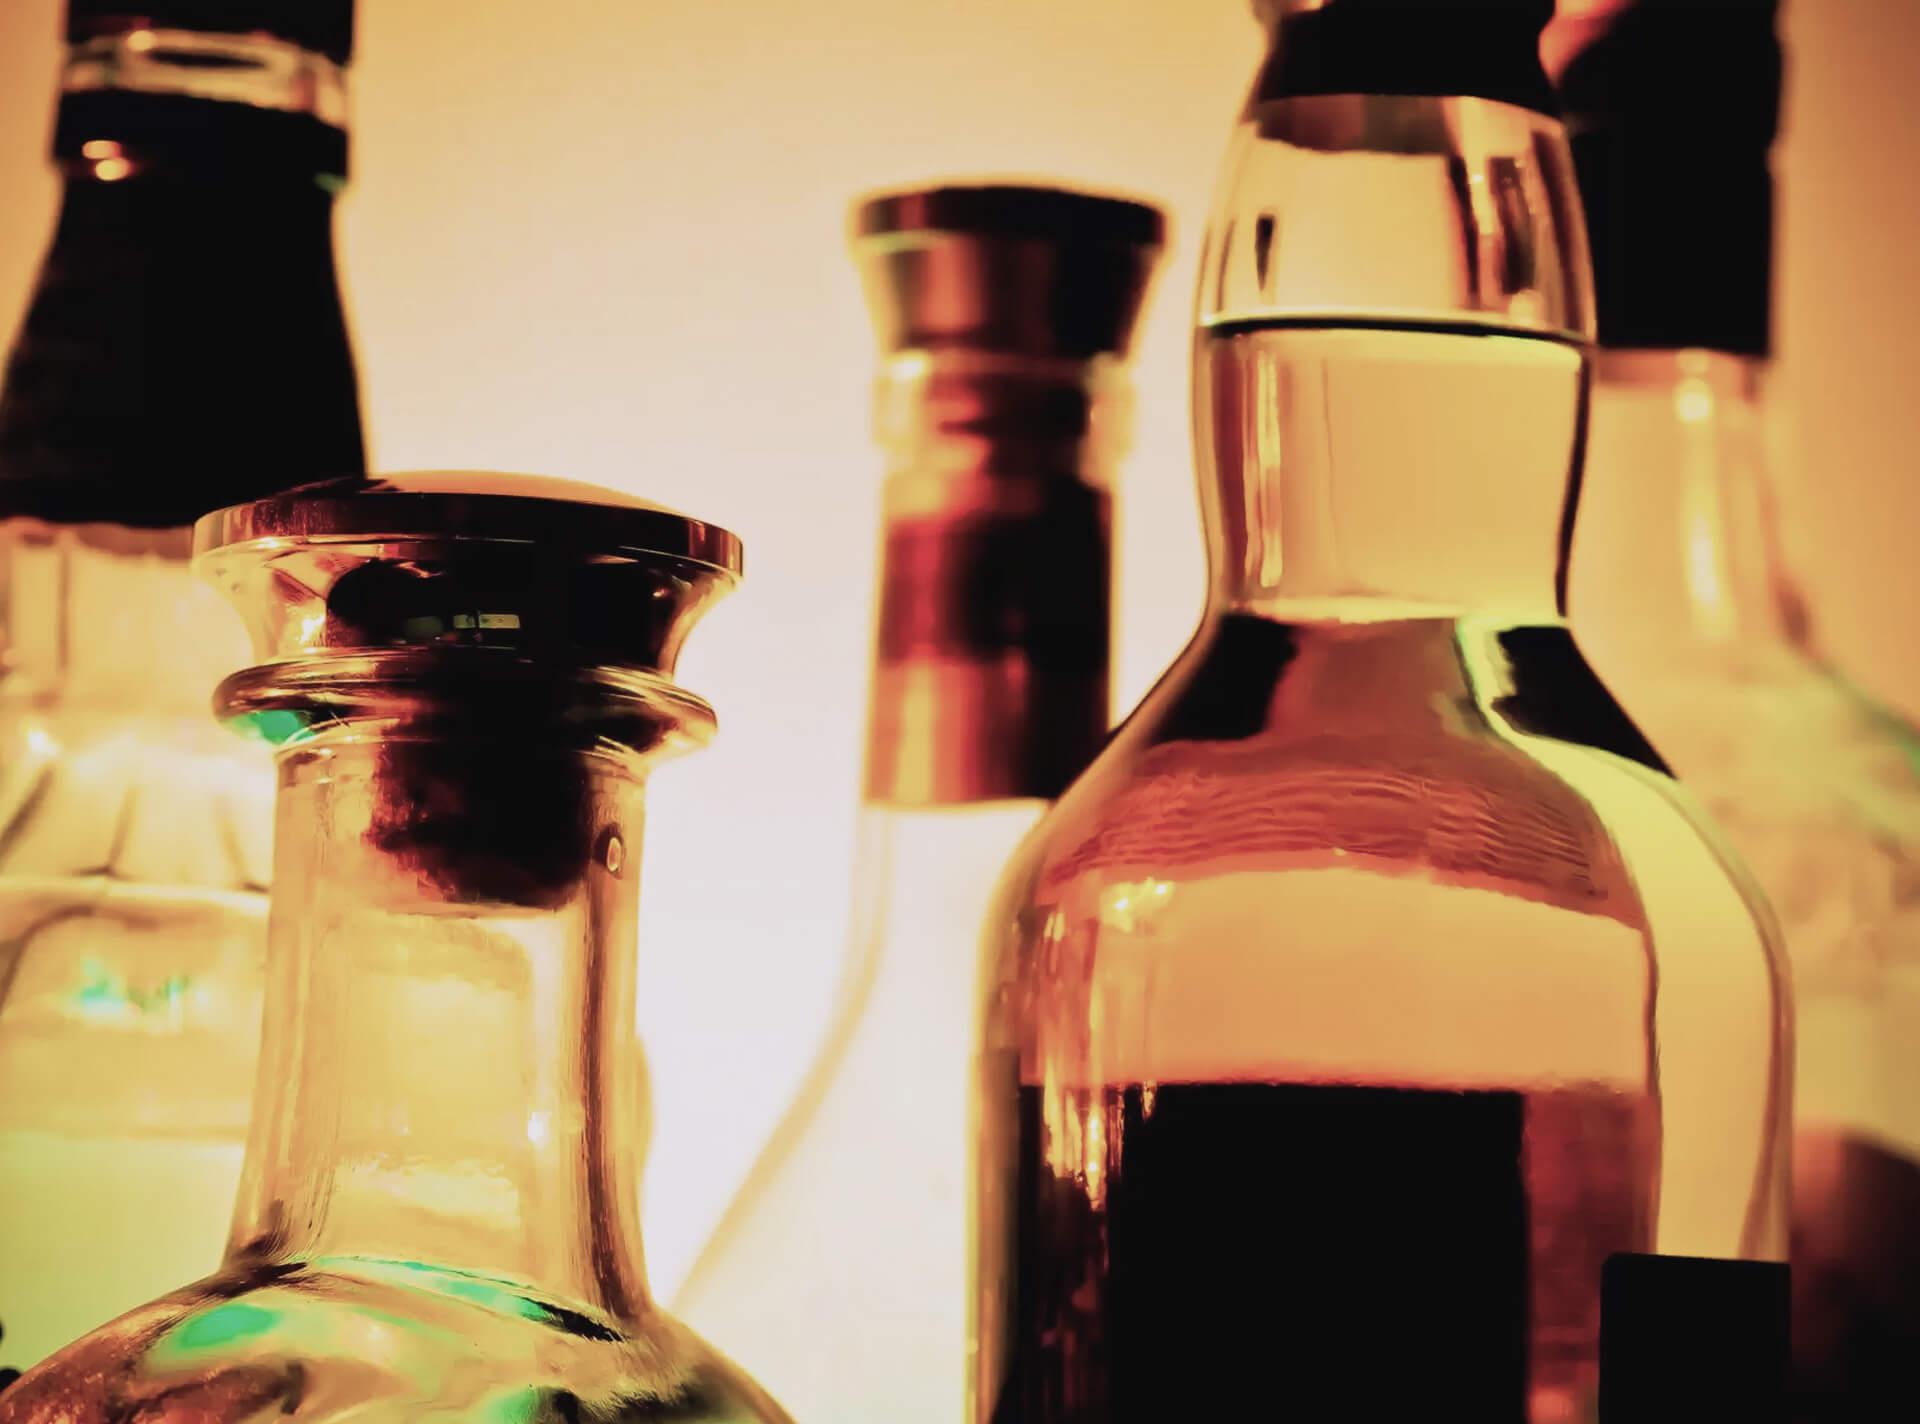 Sinais e sintomas de dependência de álcool e drogas